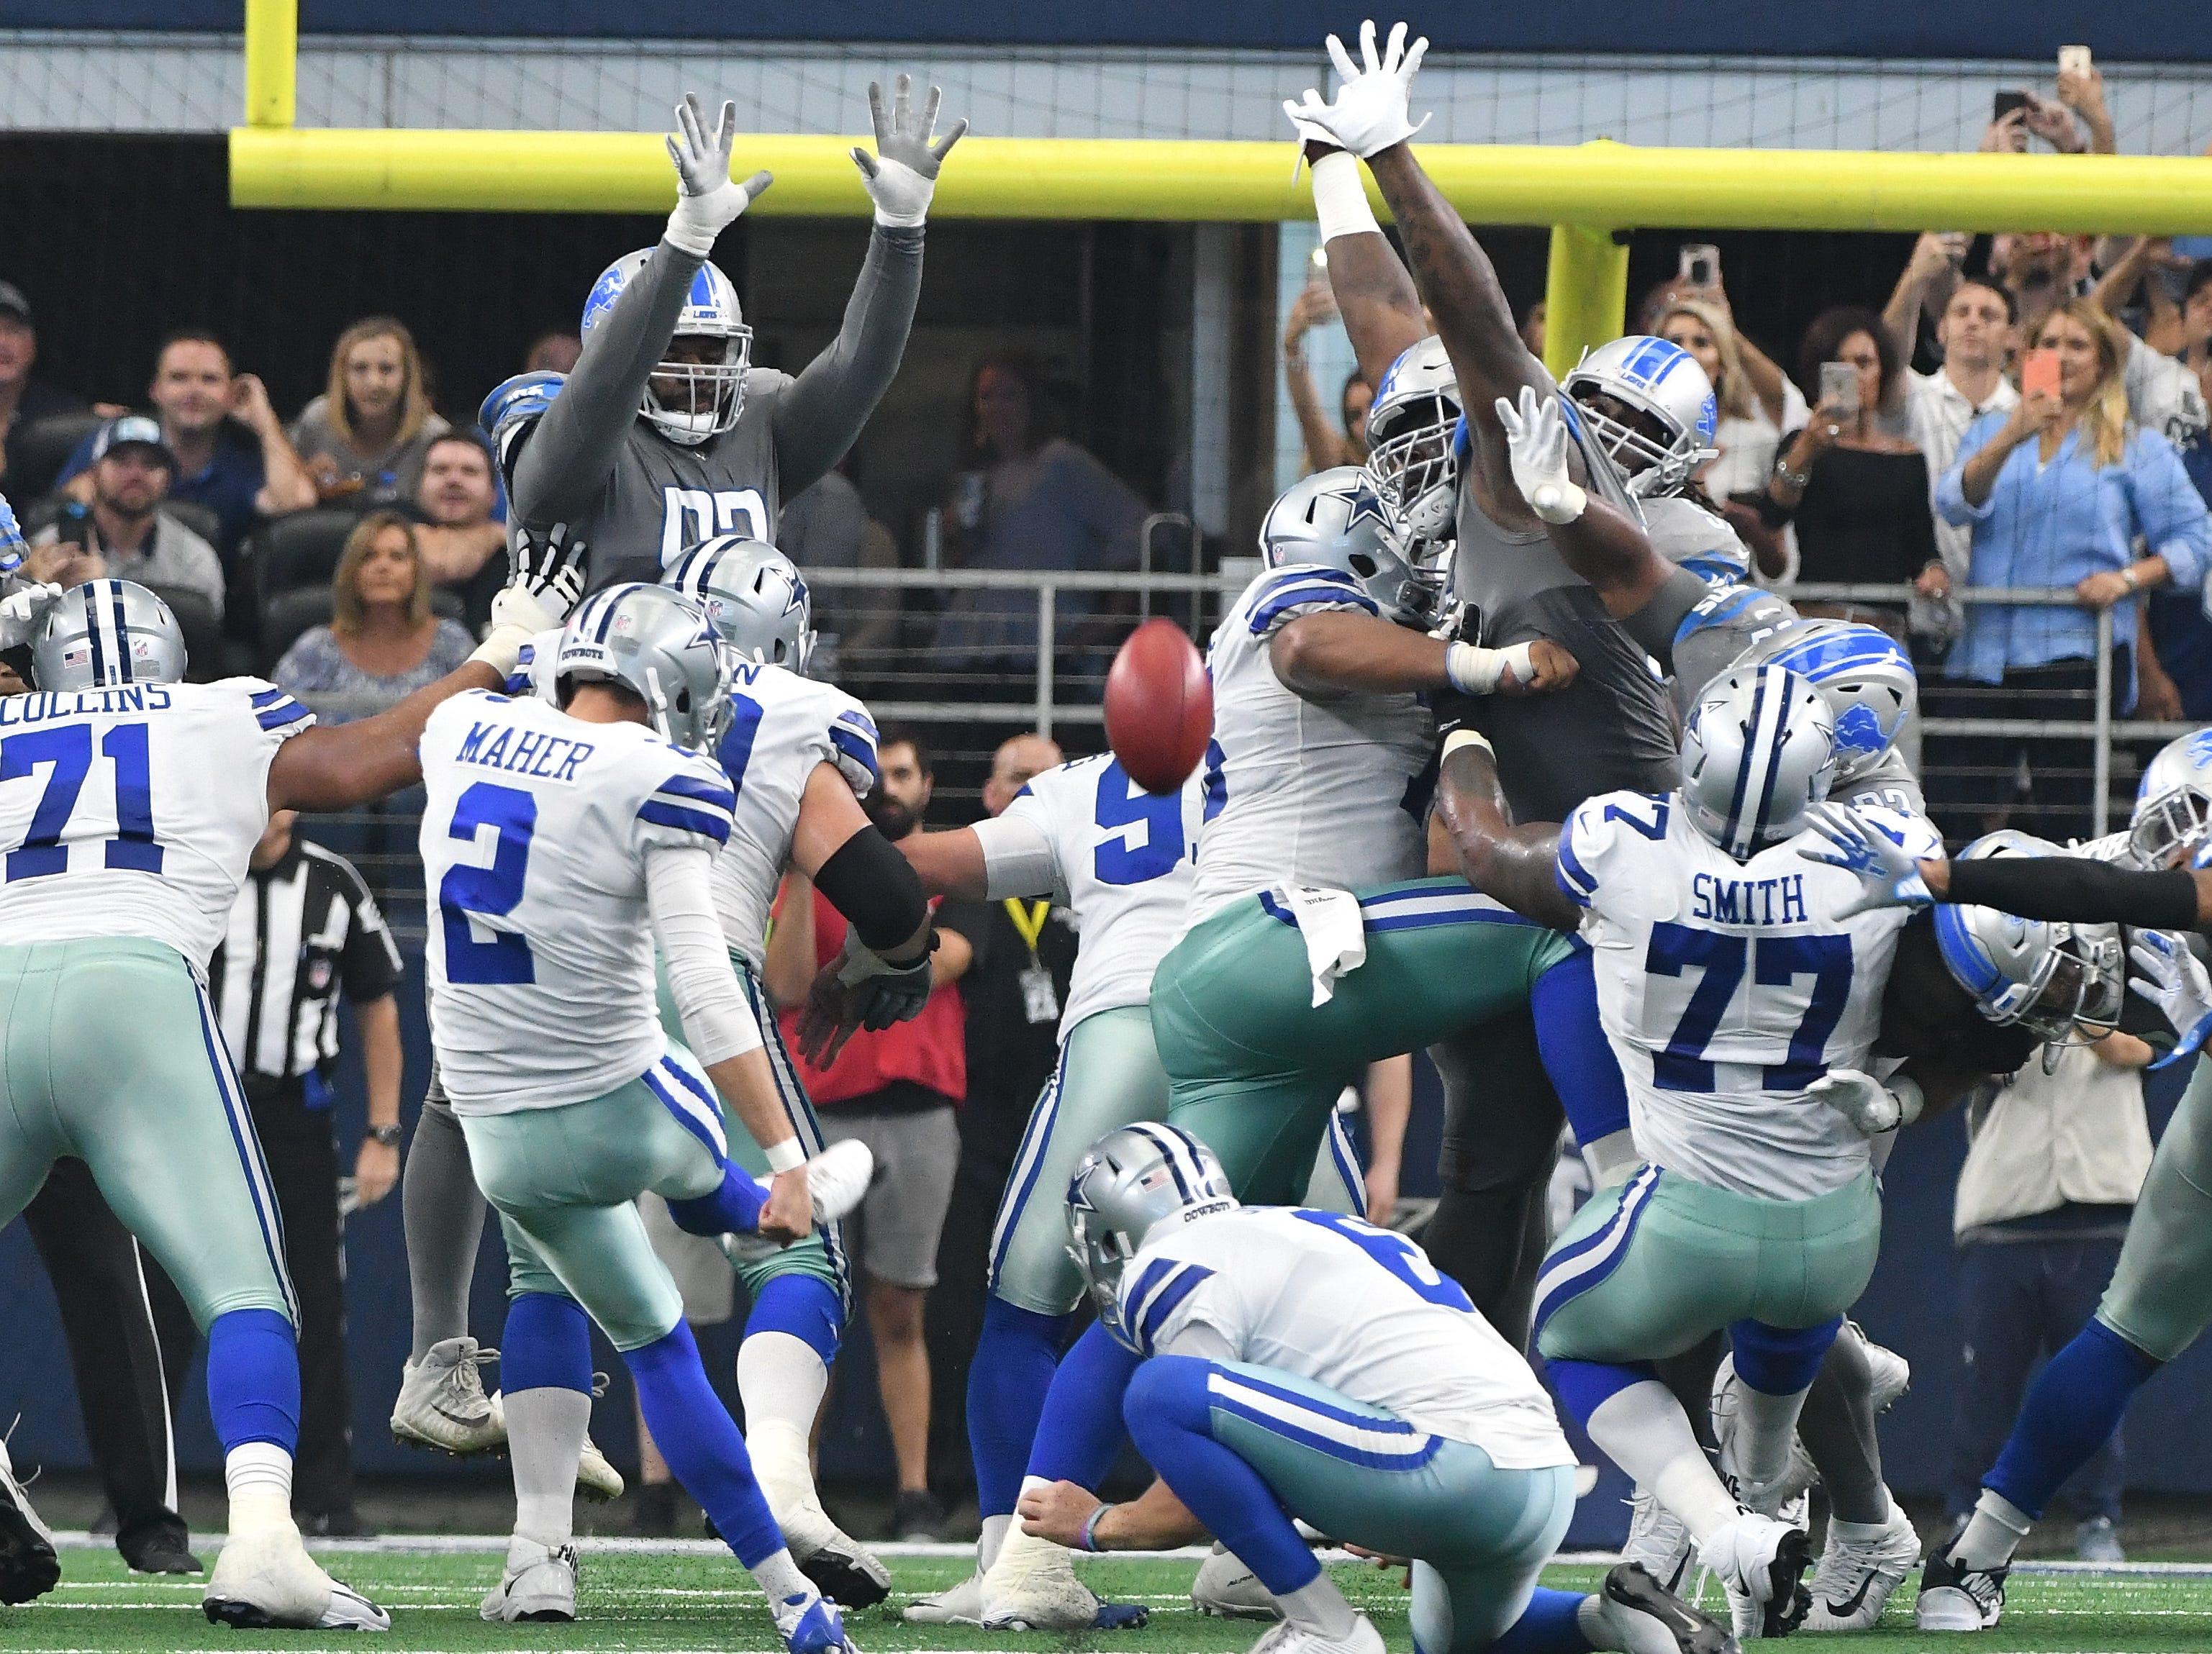 Cowboys kicker Brett Maher splits the uprights, winning the games with a last second field goal, 26-24.